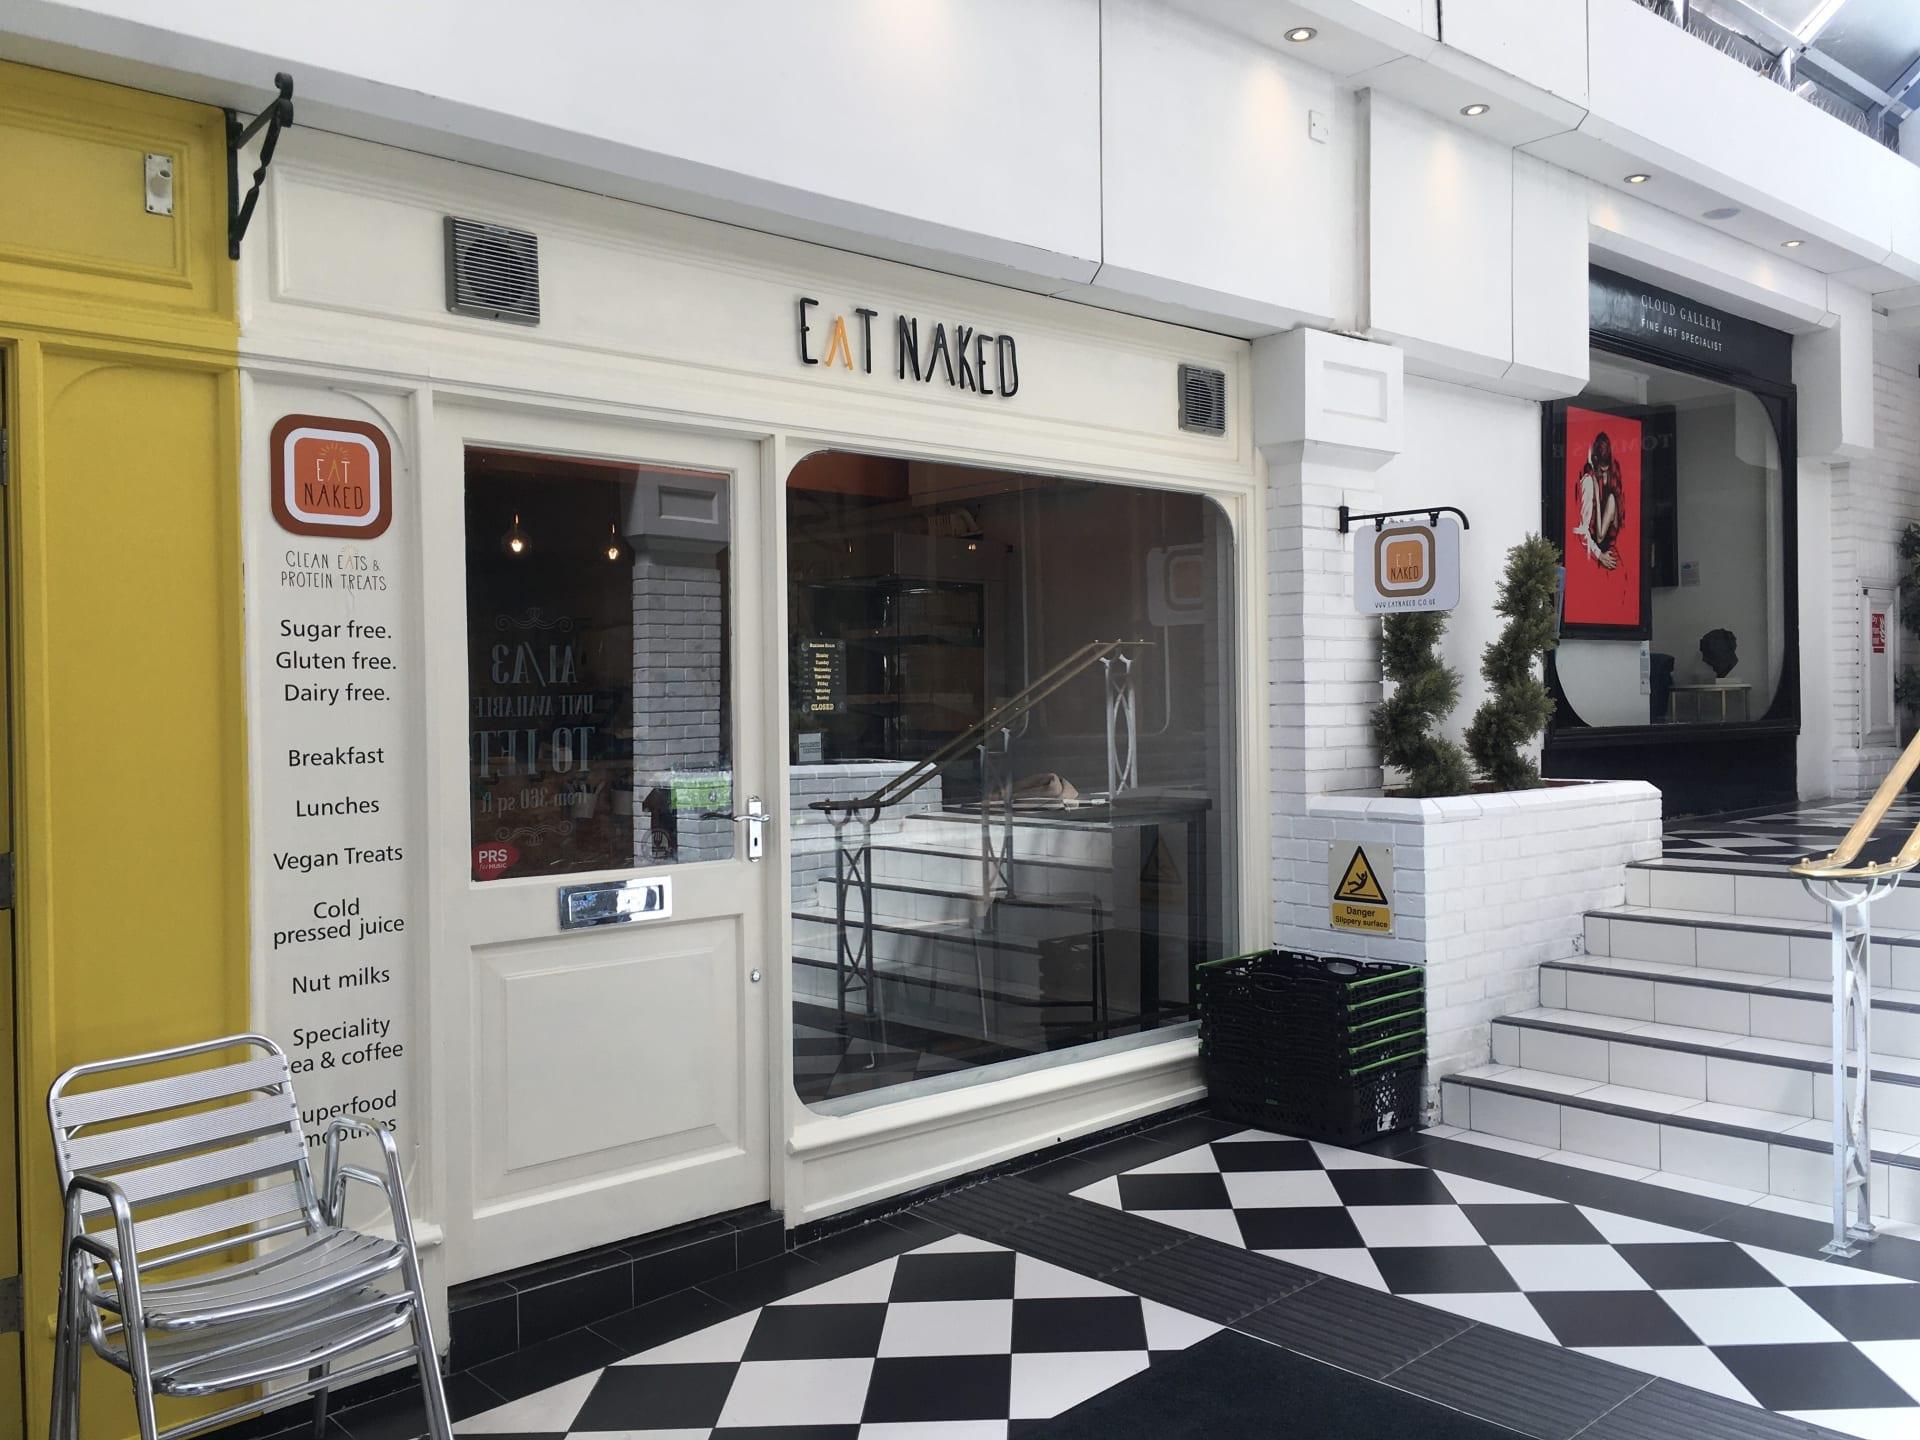 East Street Arcade Brighton image.